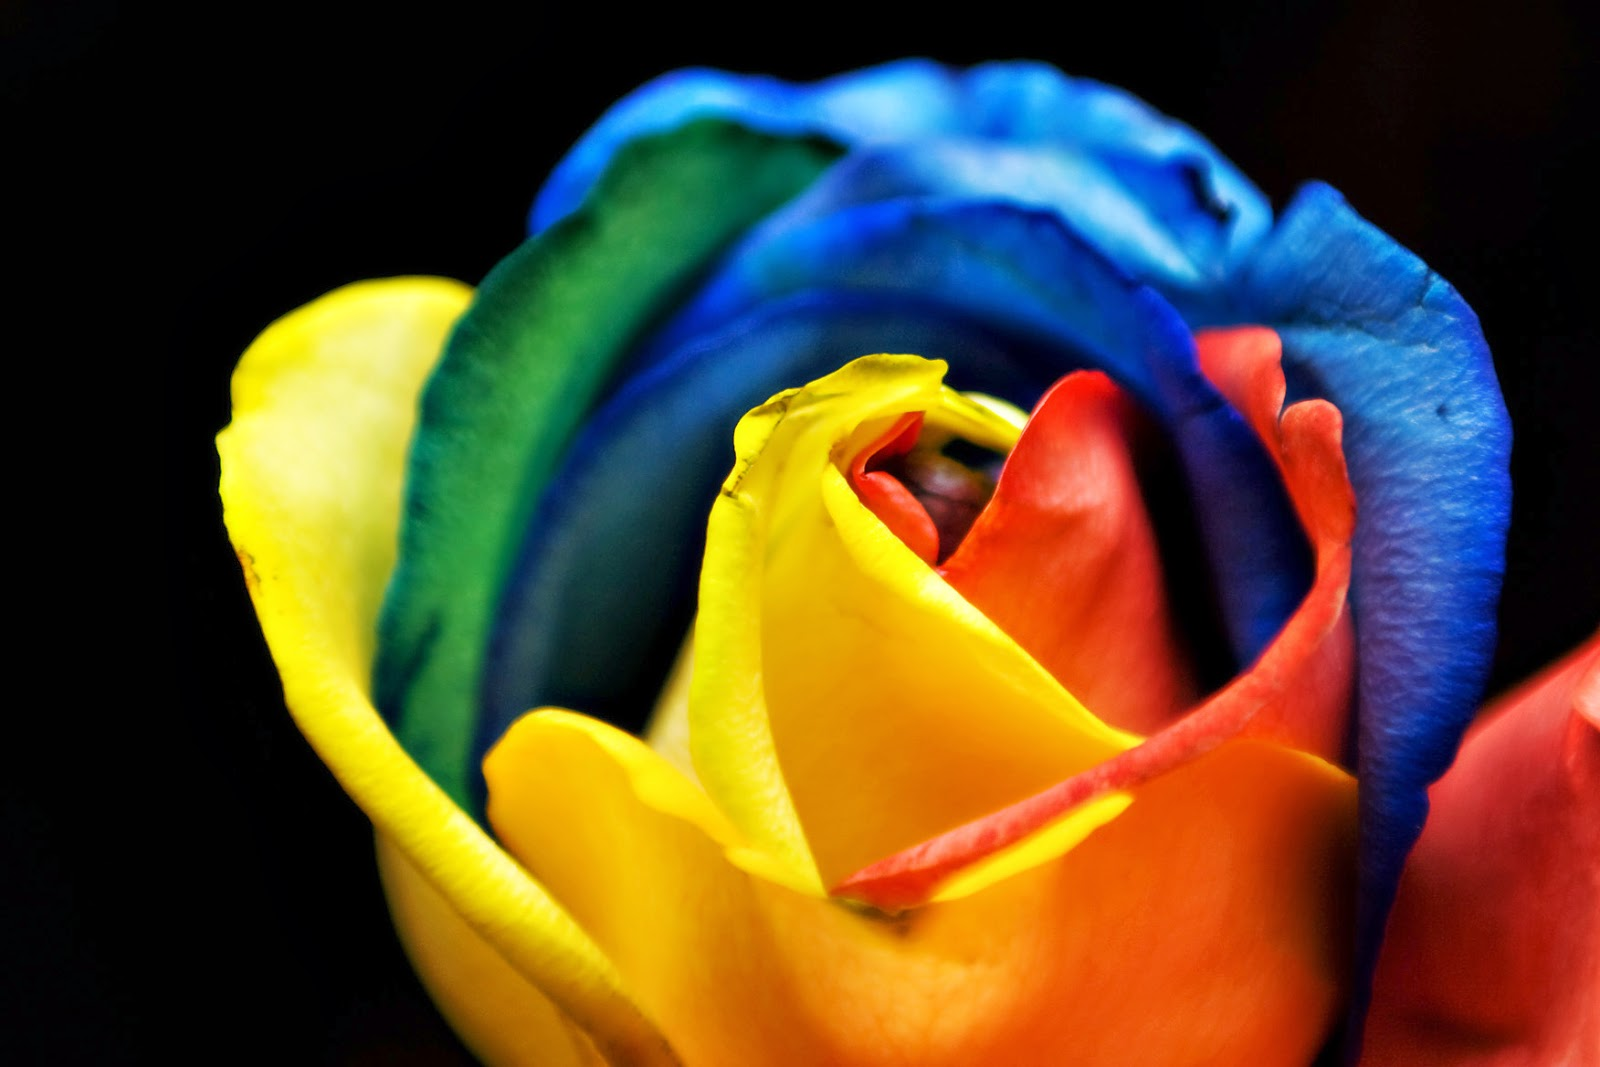 WHAT IS A RAINBOW ROSE?  The Garden of Eaden